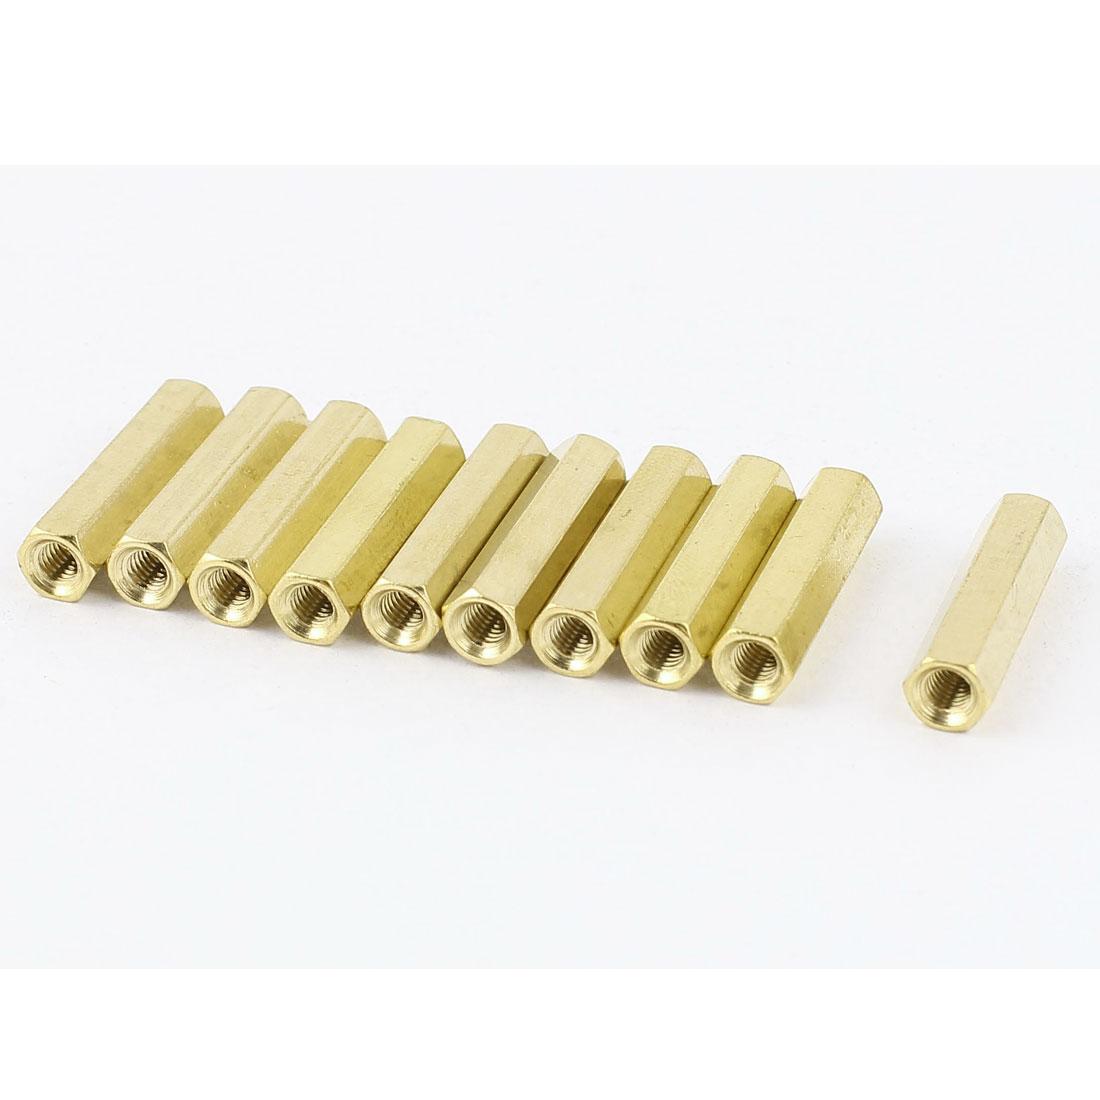 M3 x 20mm Female/Female Thread Brass Hex Standoff PCB Pillar Spacer 10pcs